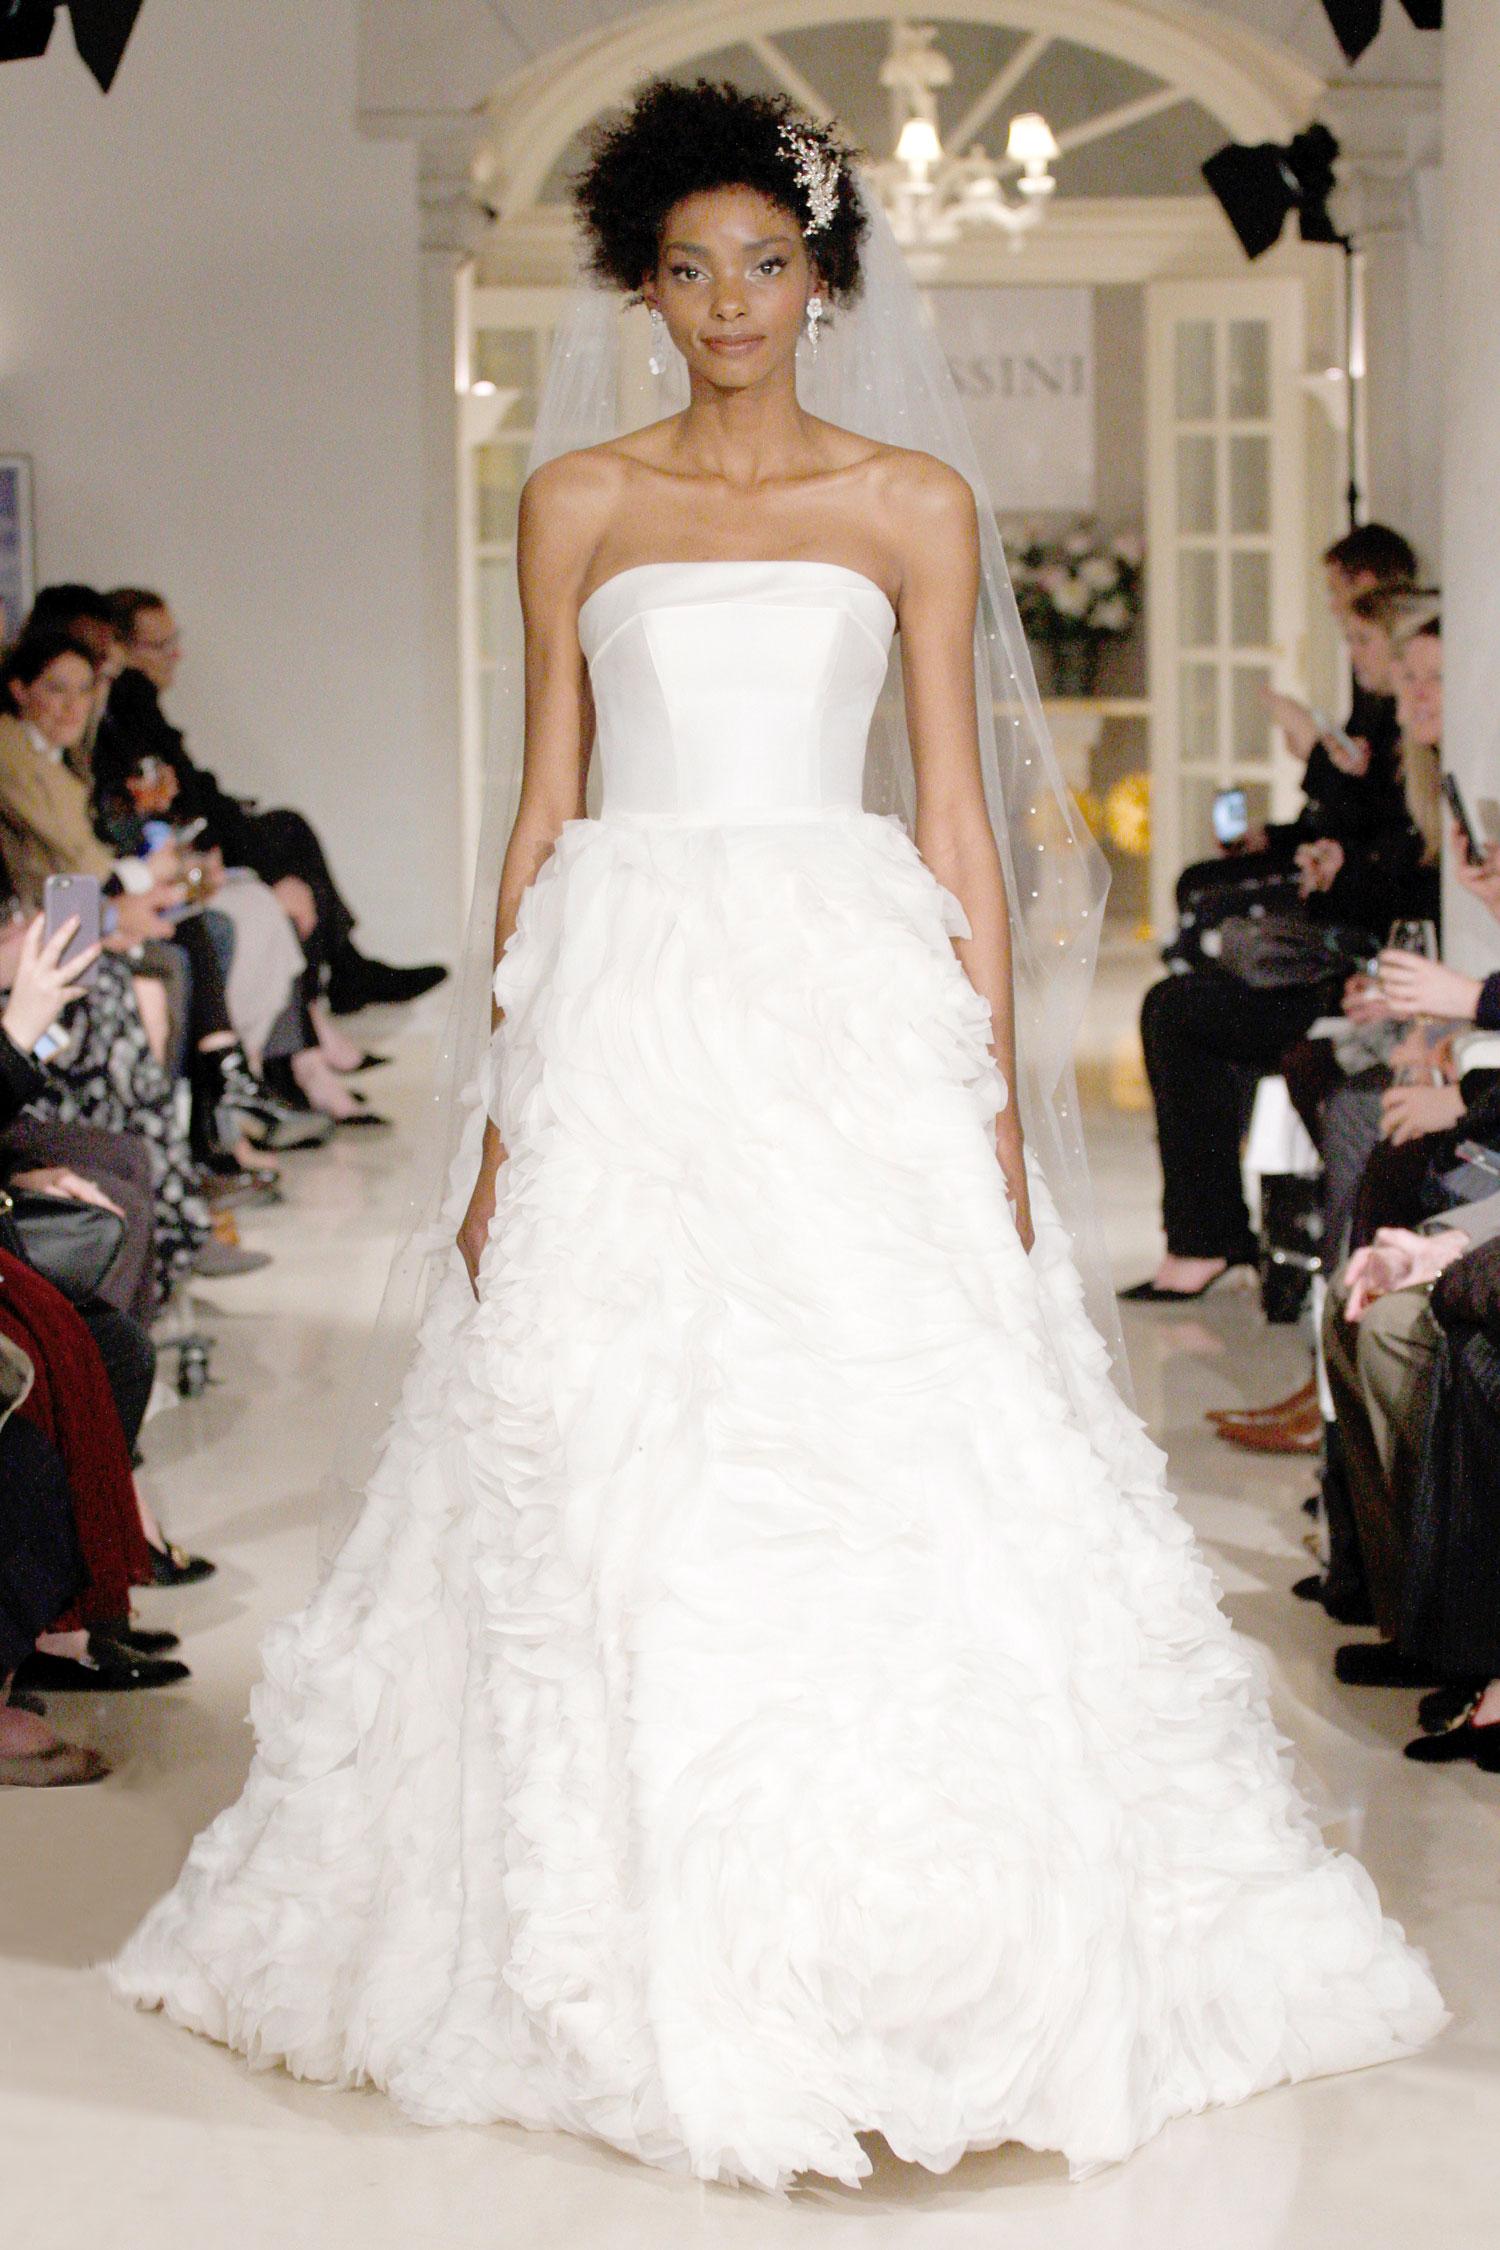 Meghan Markle wedding dress inspiration Oleg Cassini silk bodice